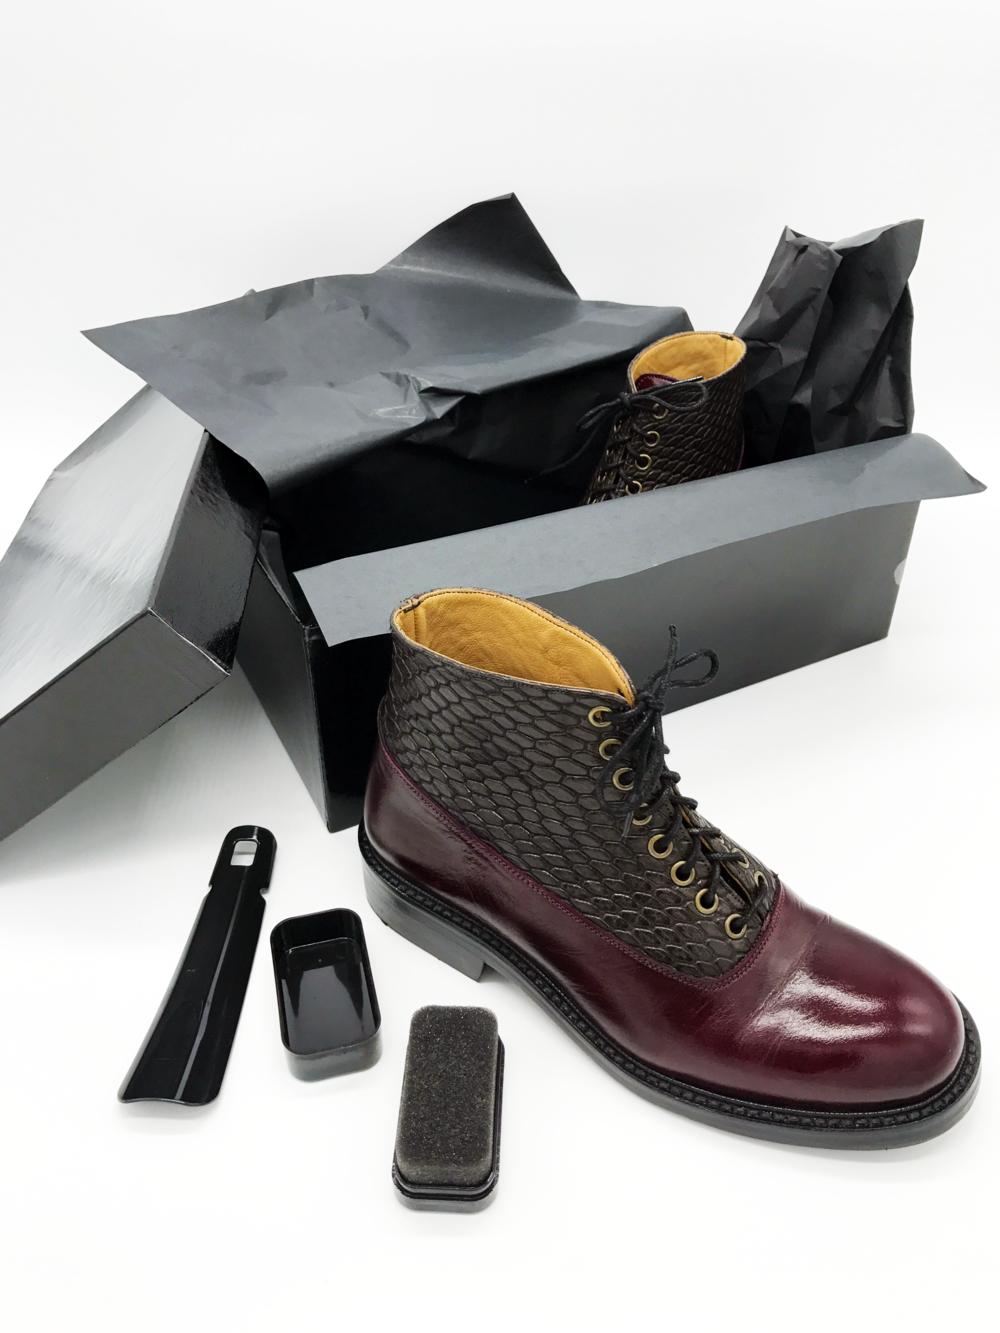 Coming Soon! - Duchess Custom Handmade Shoes